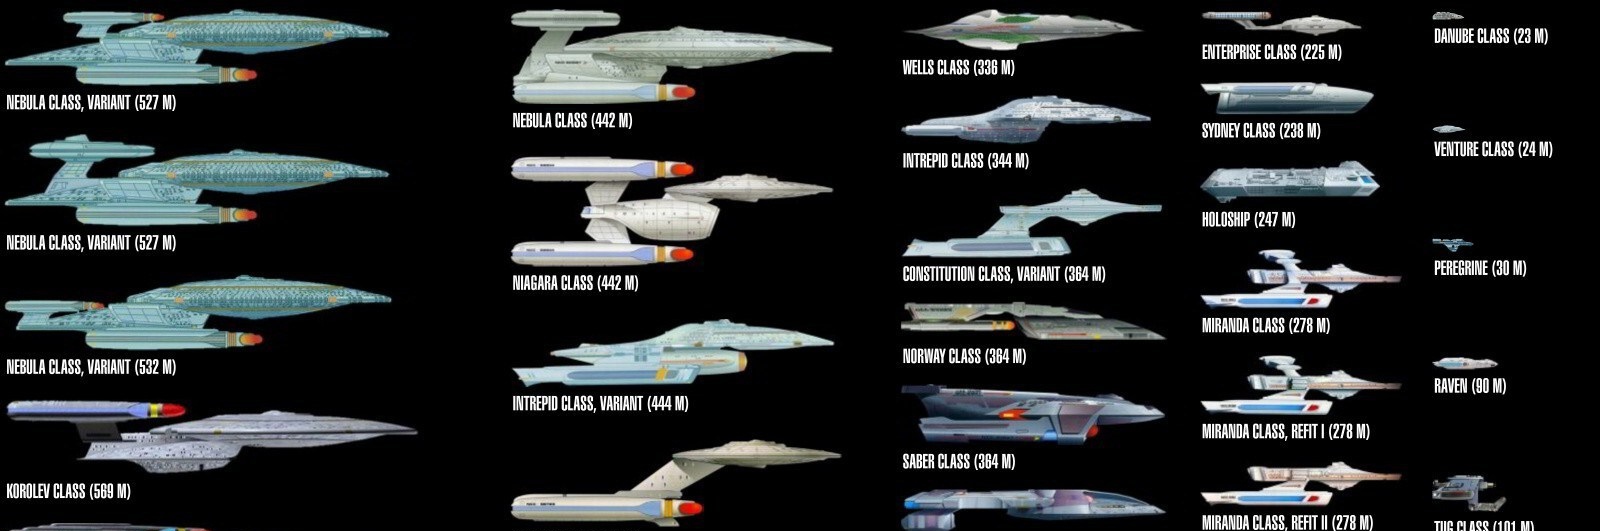 starfleet-ships-classes